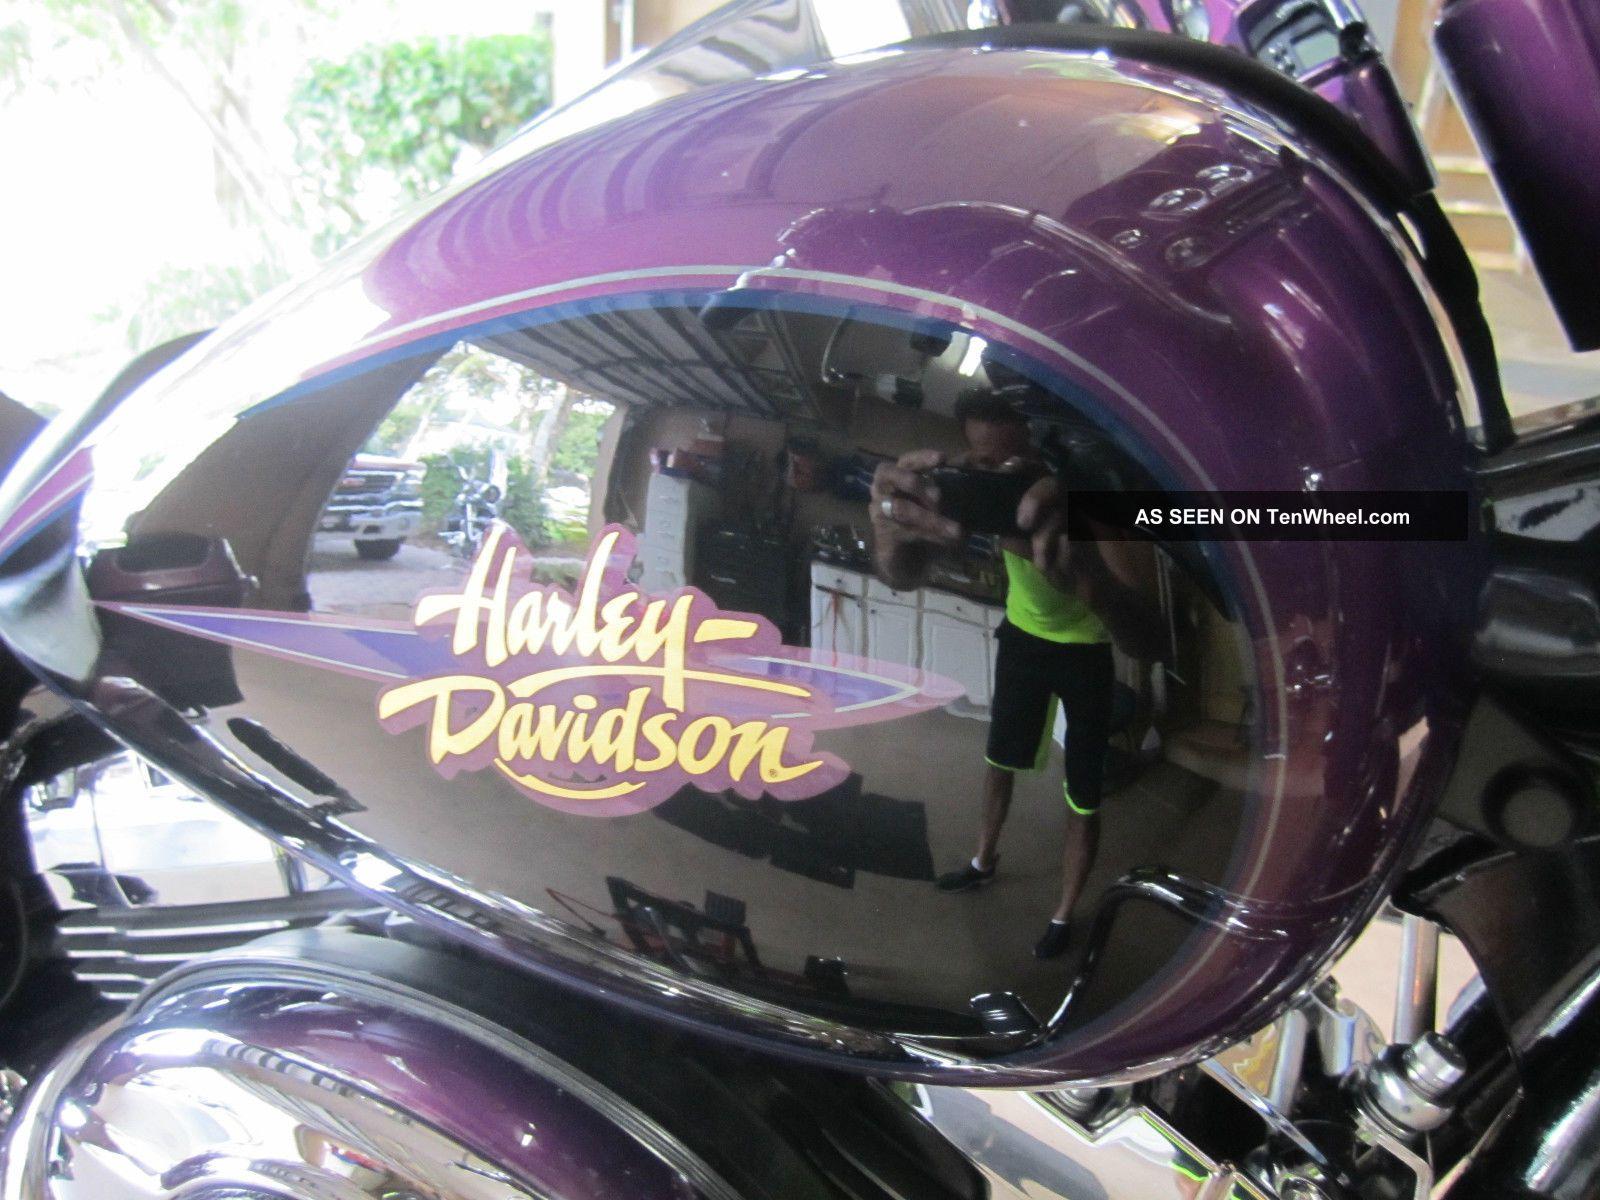 2011 Harley - Davidson Flhx Street Glide Special Ordered H